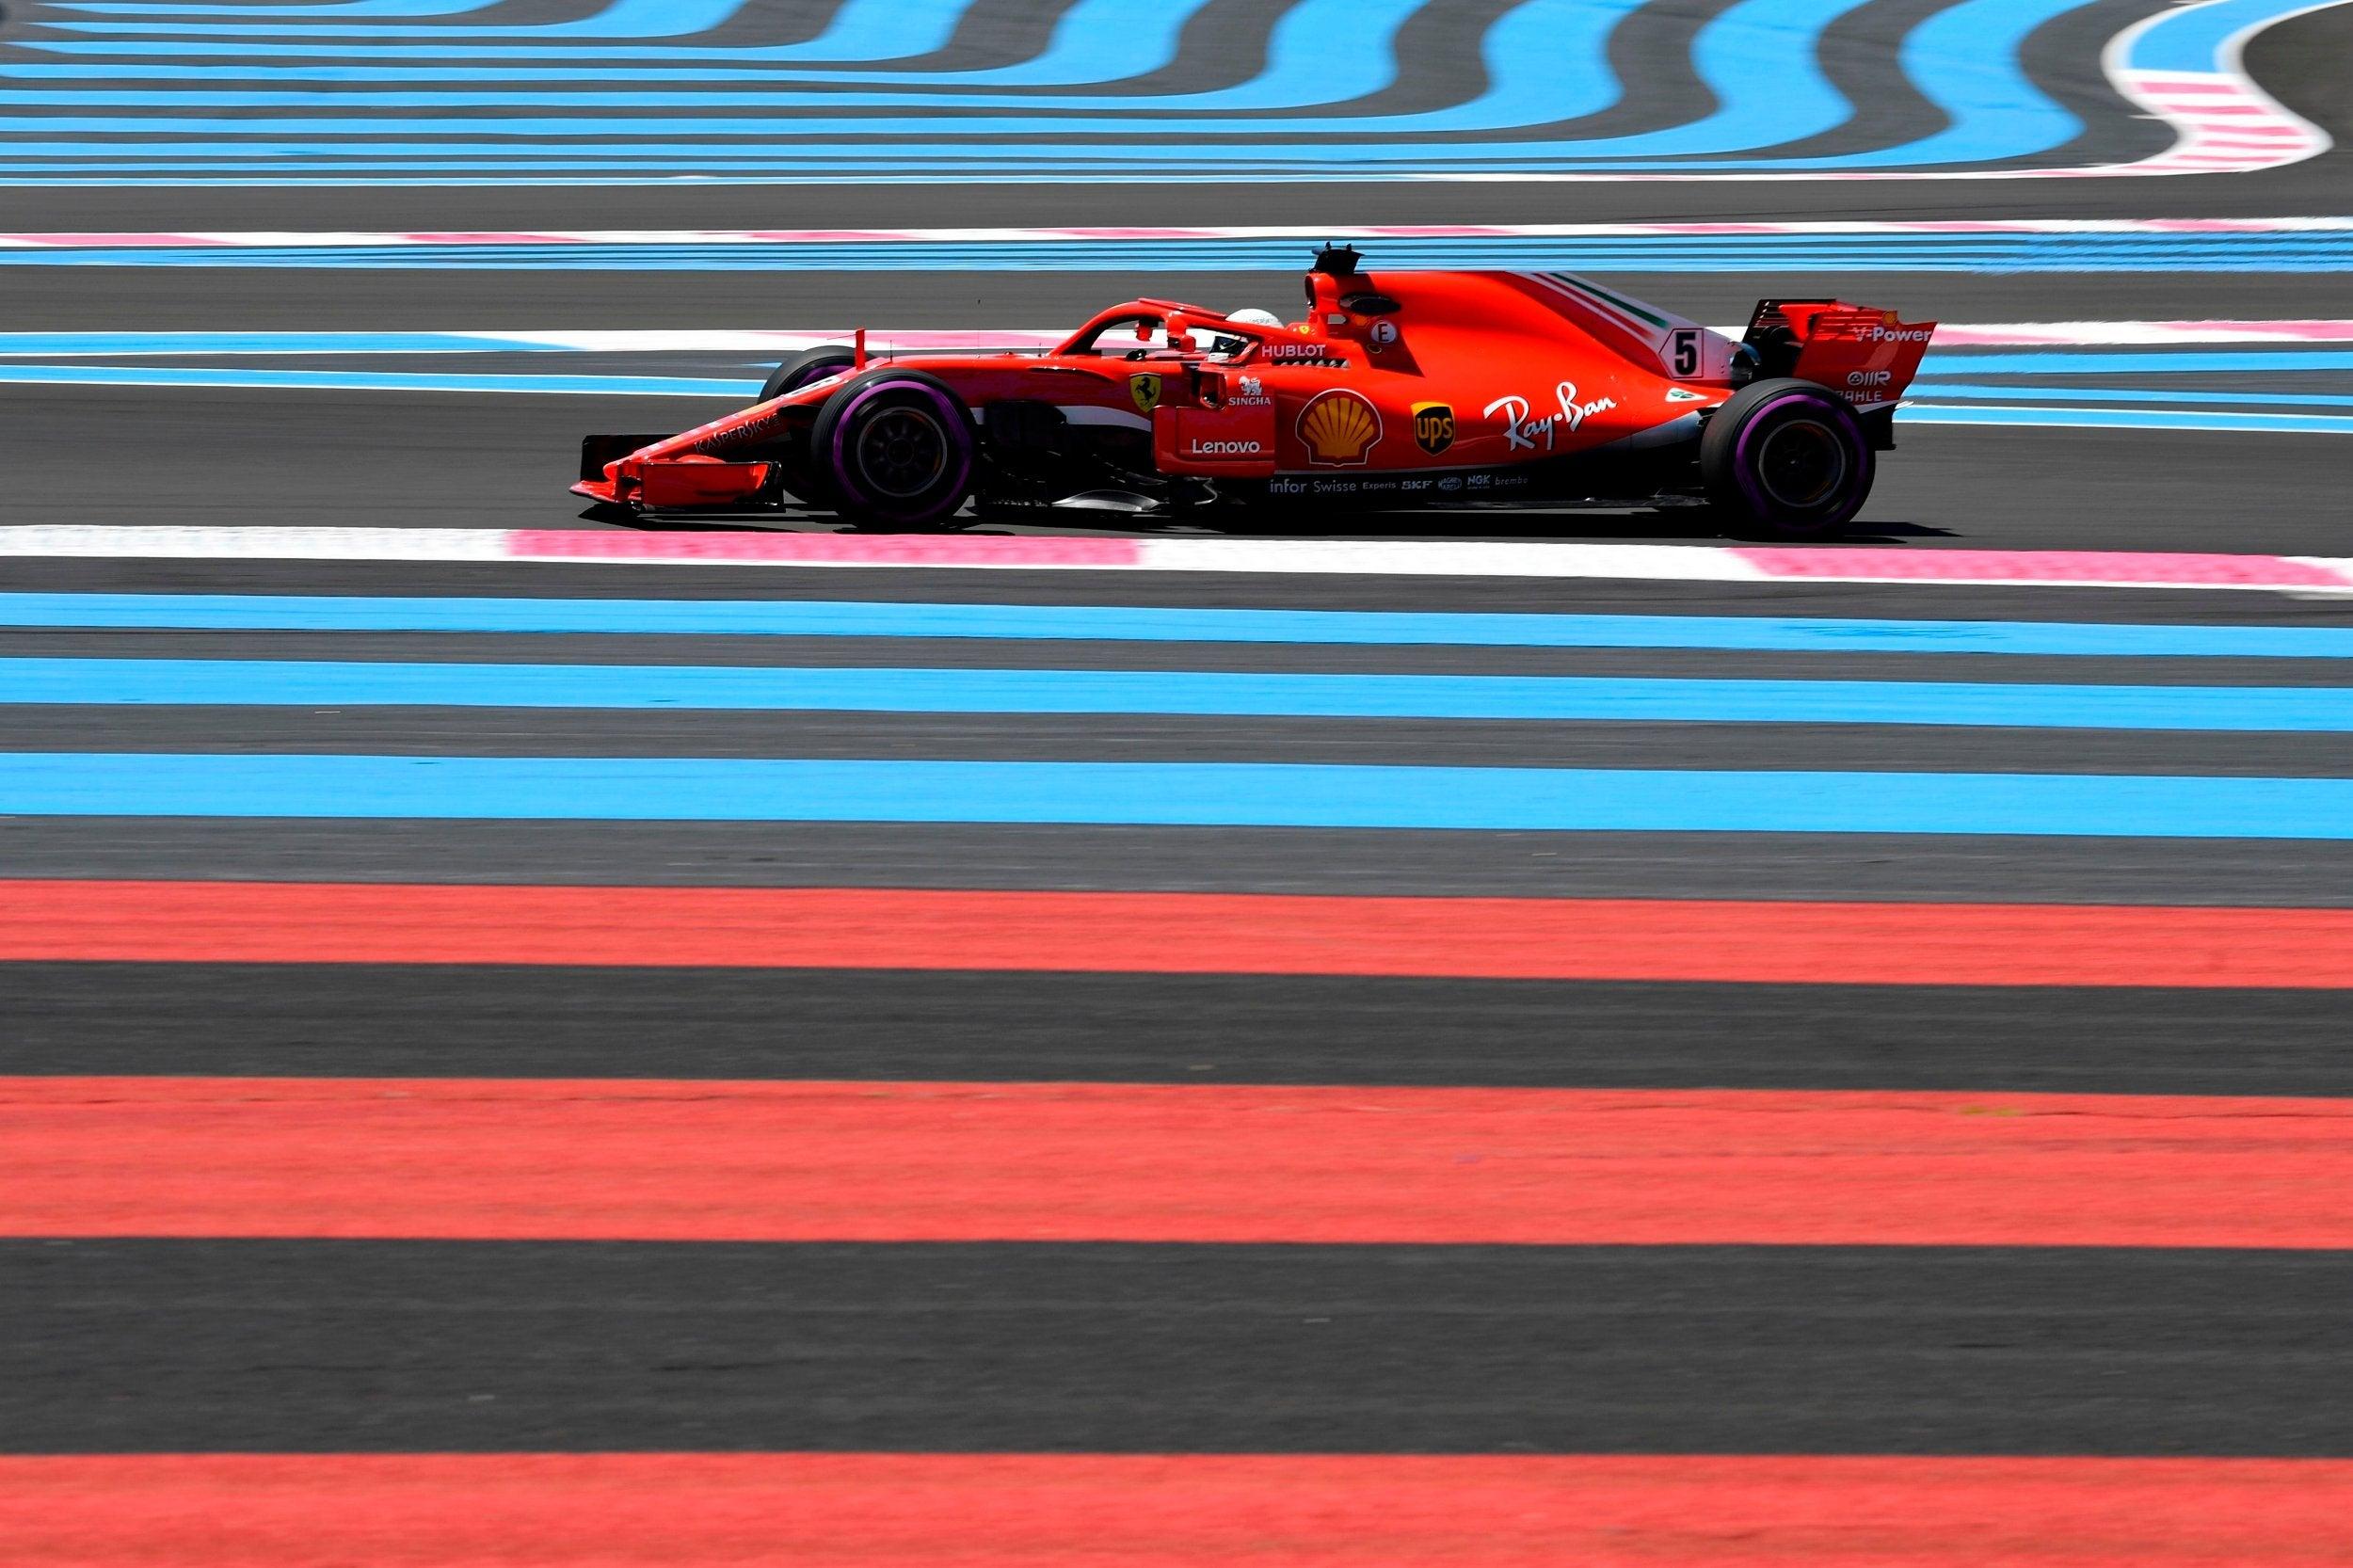 Live F1 stream site hosting French Grand Prix 2018 for free